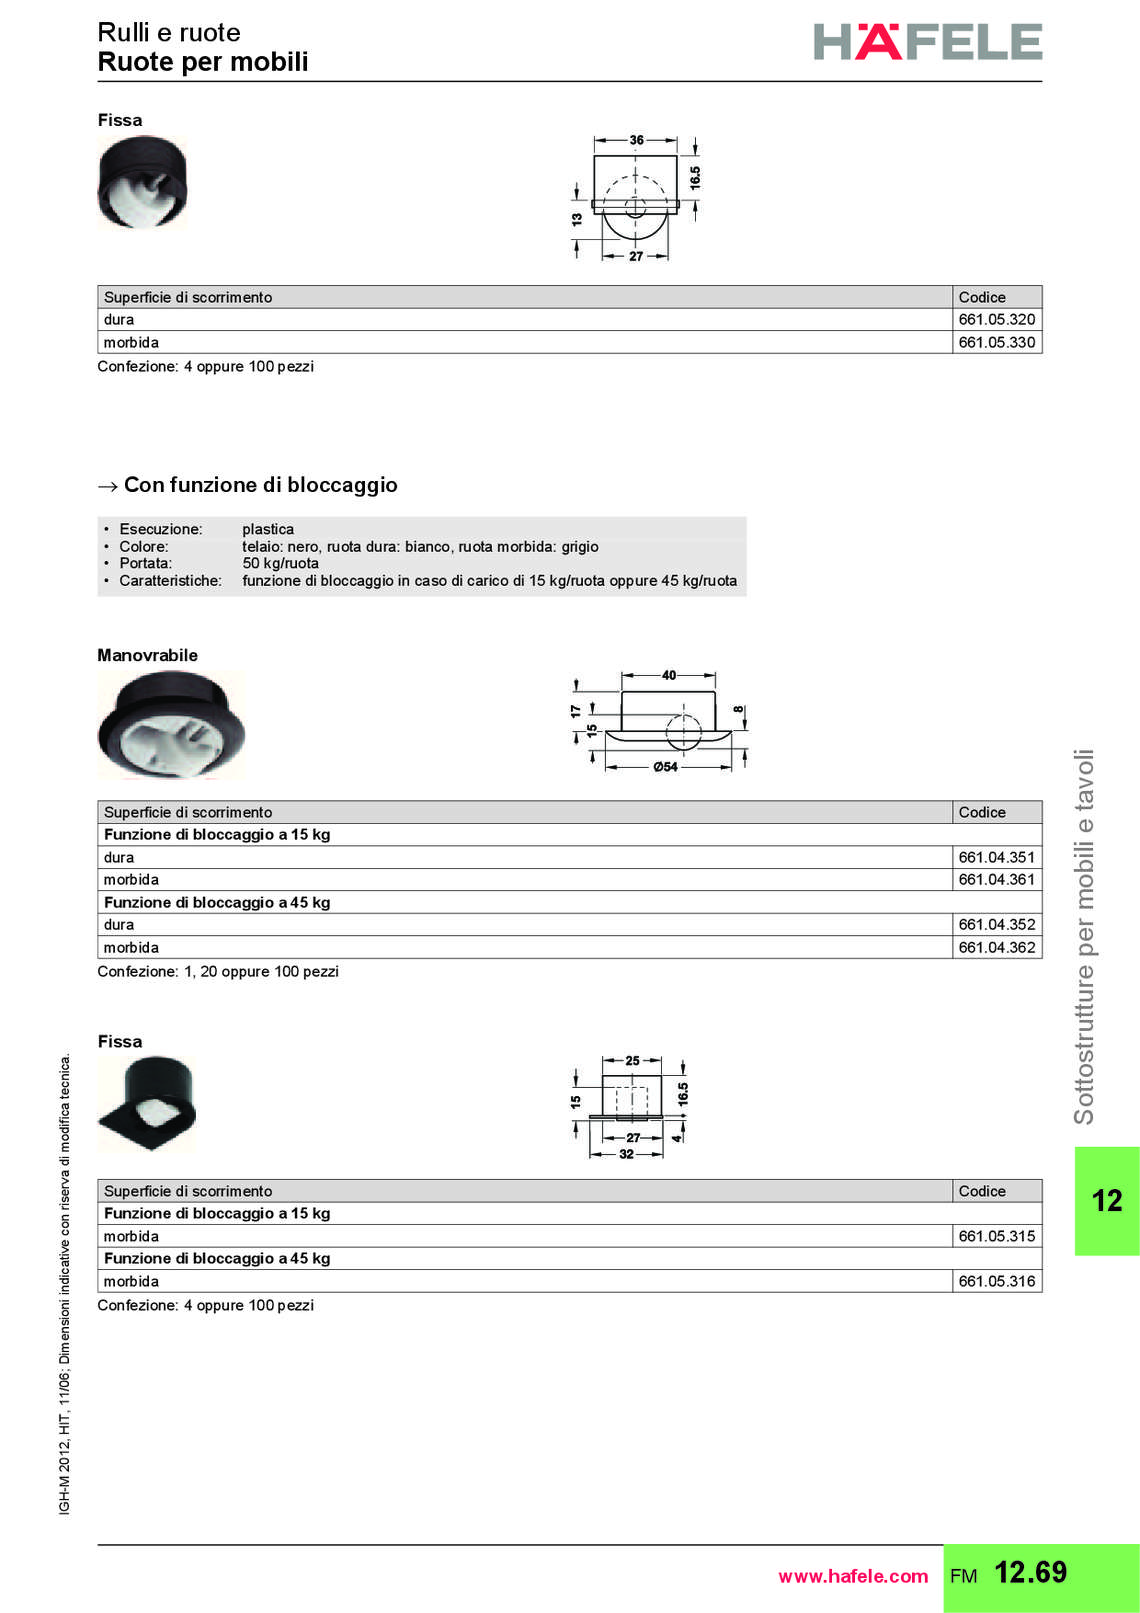 hafele-sottostrutture-per-mobili_83_092.jpg